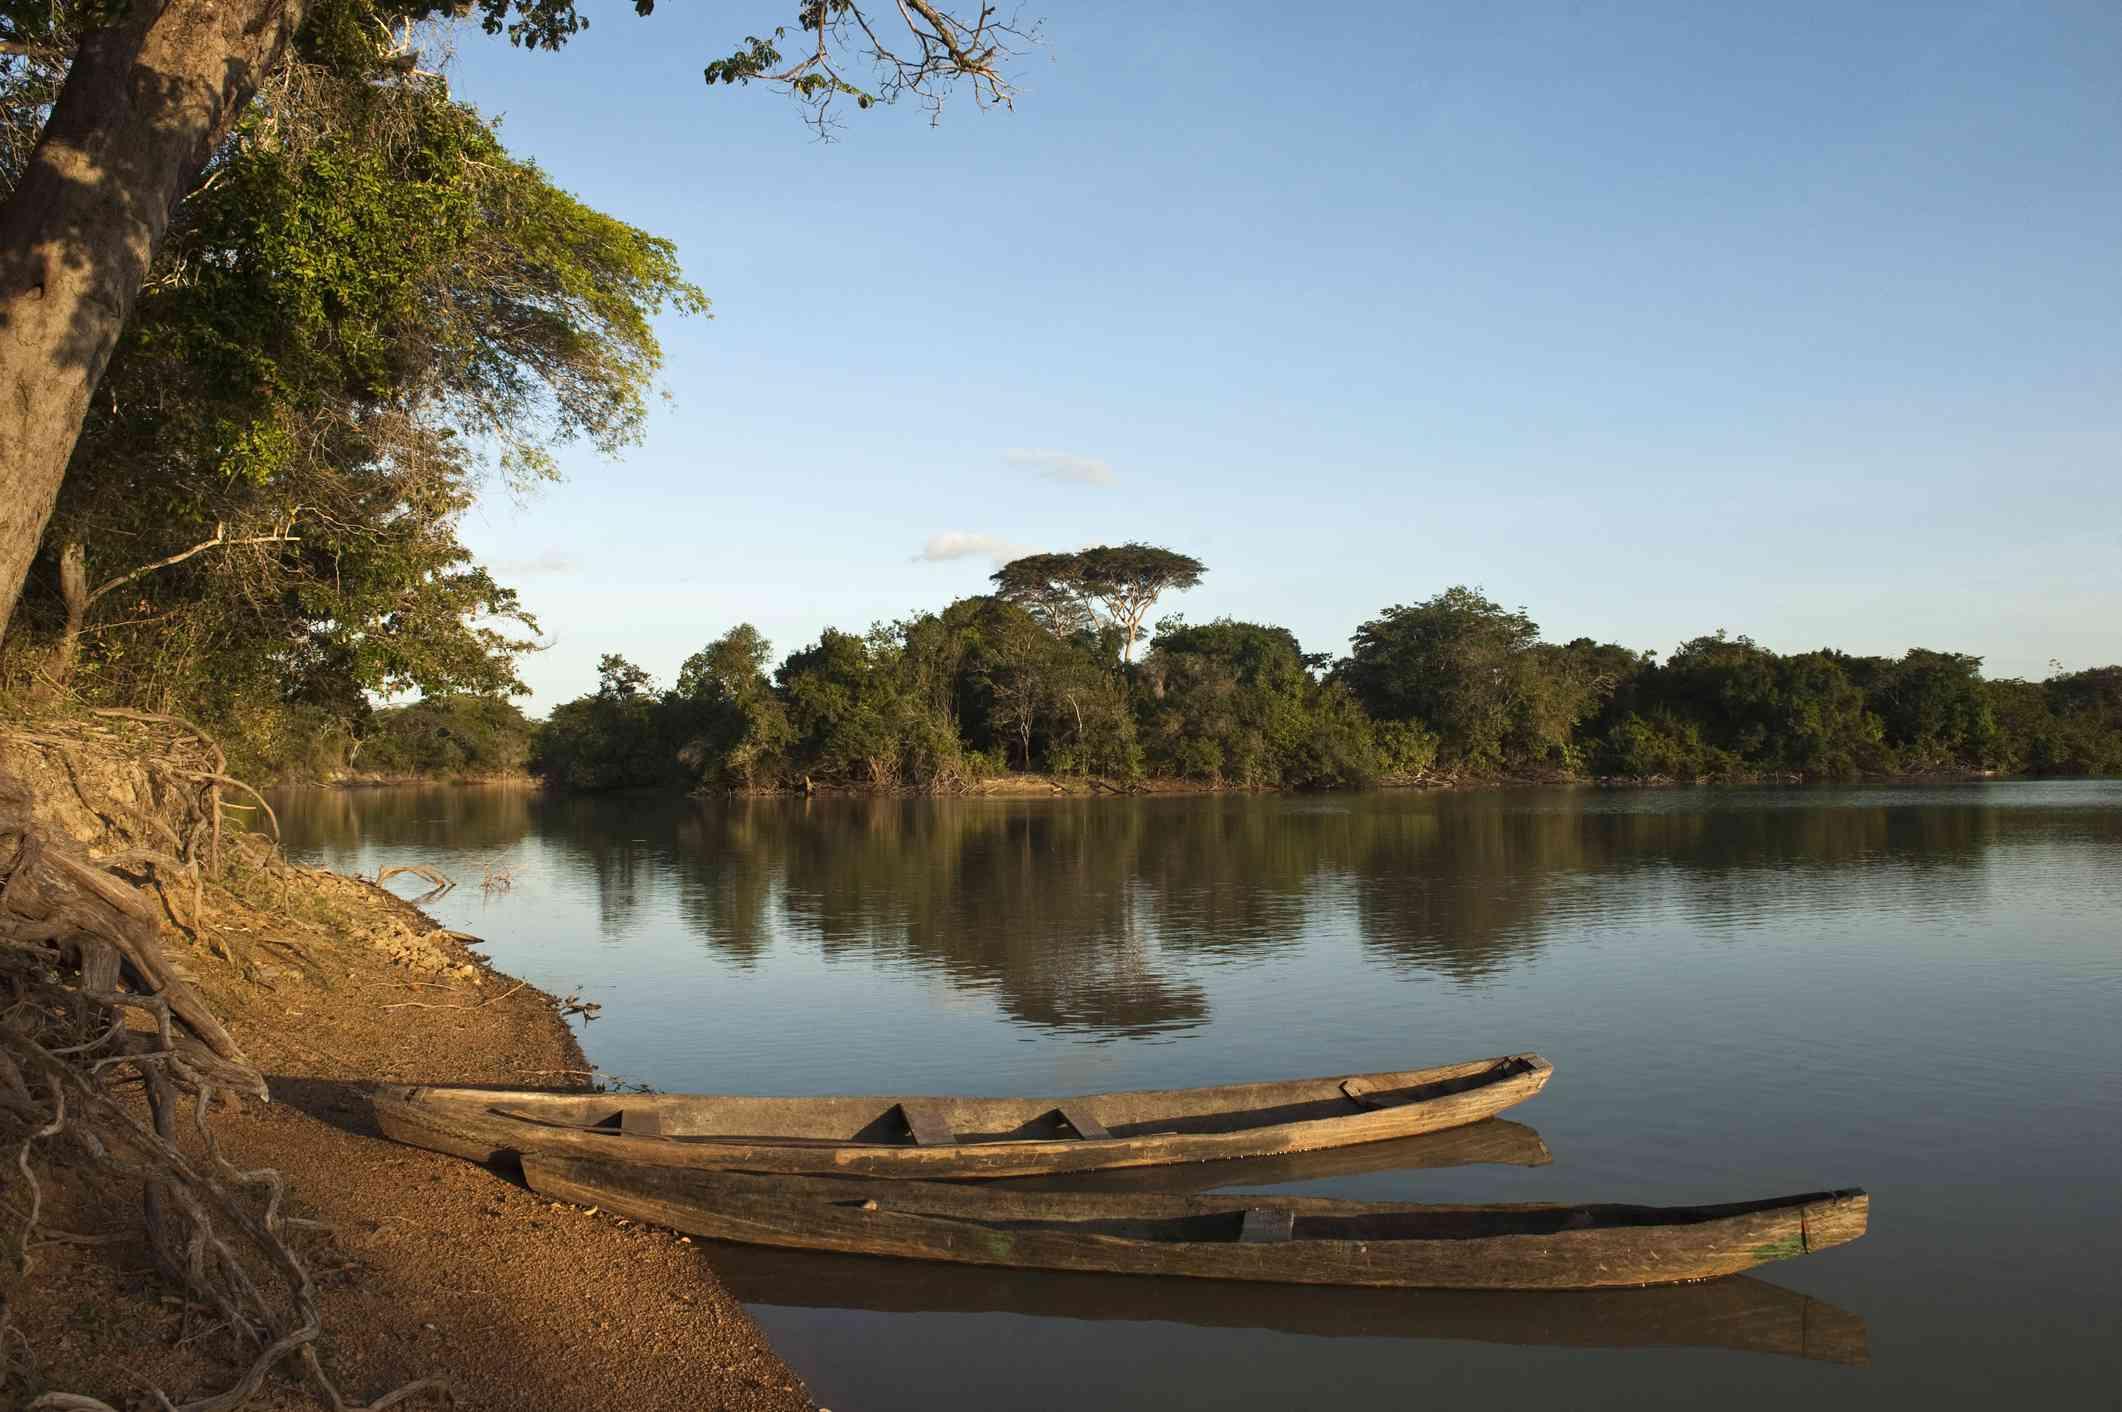 Dugout Canoe on the shore of Rupununi river, Guyana